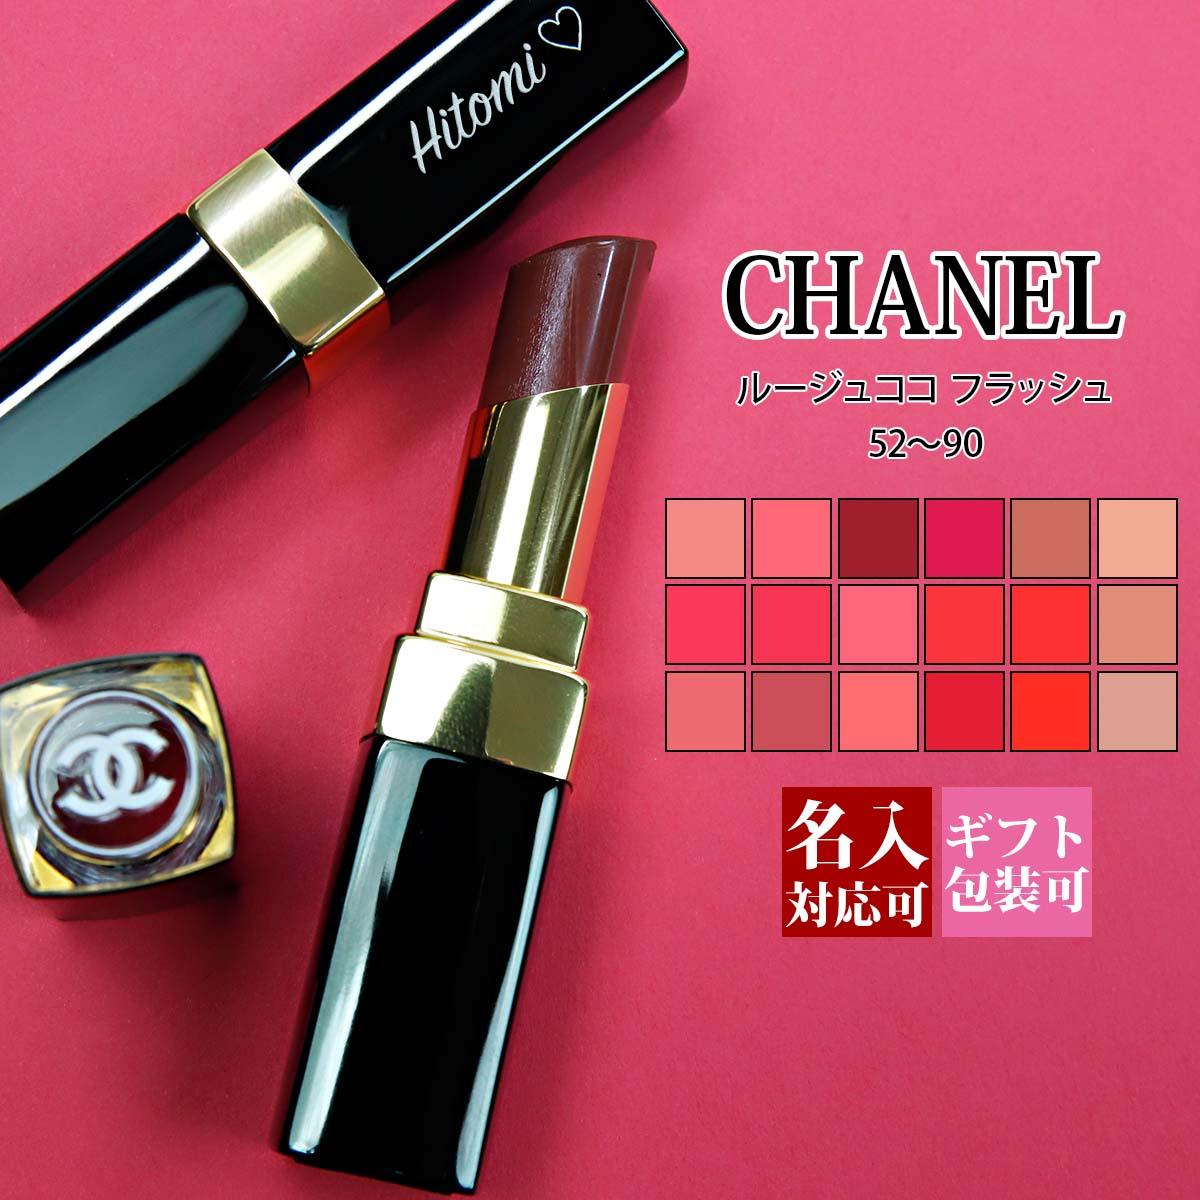 CHANEL lipstick CHANEL